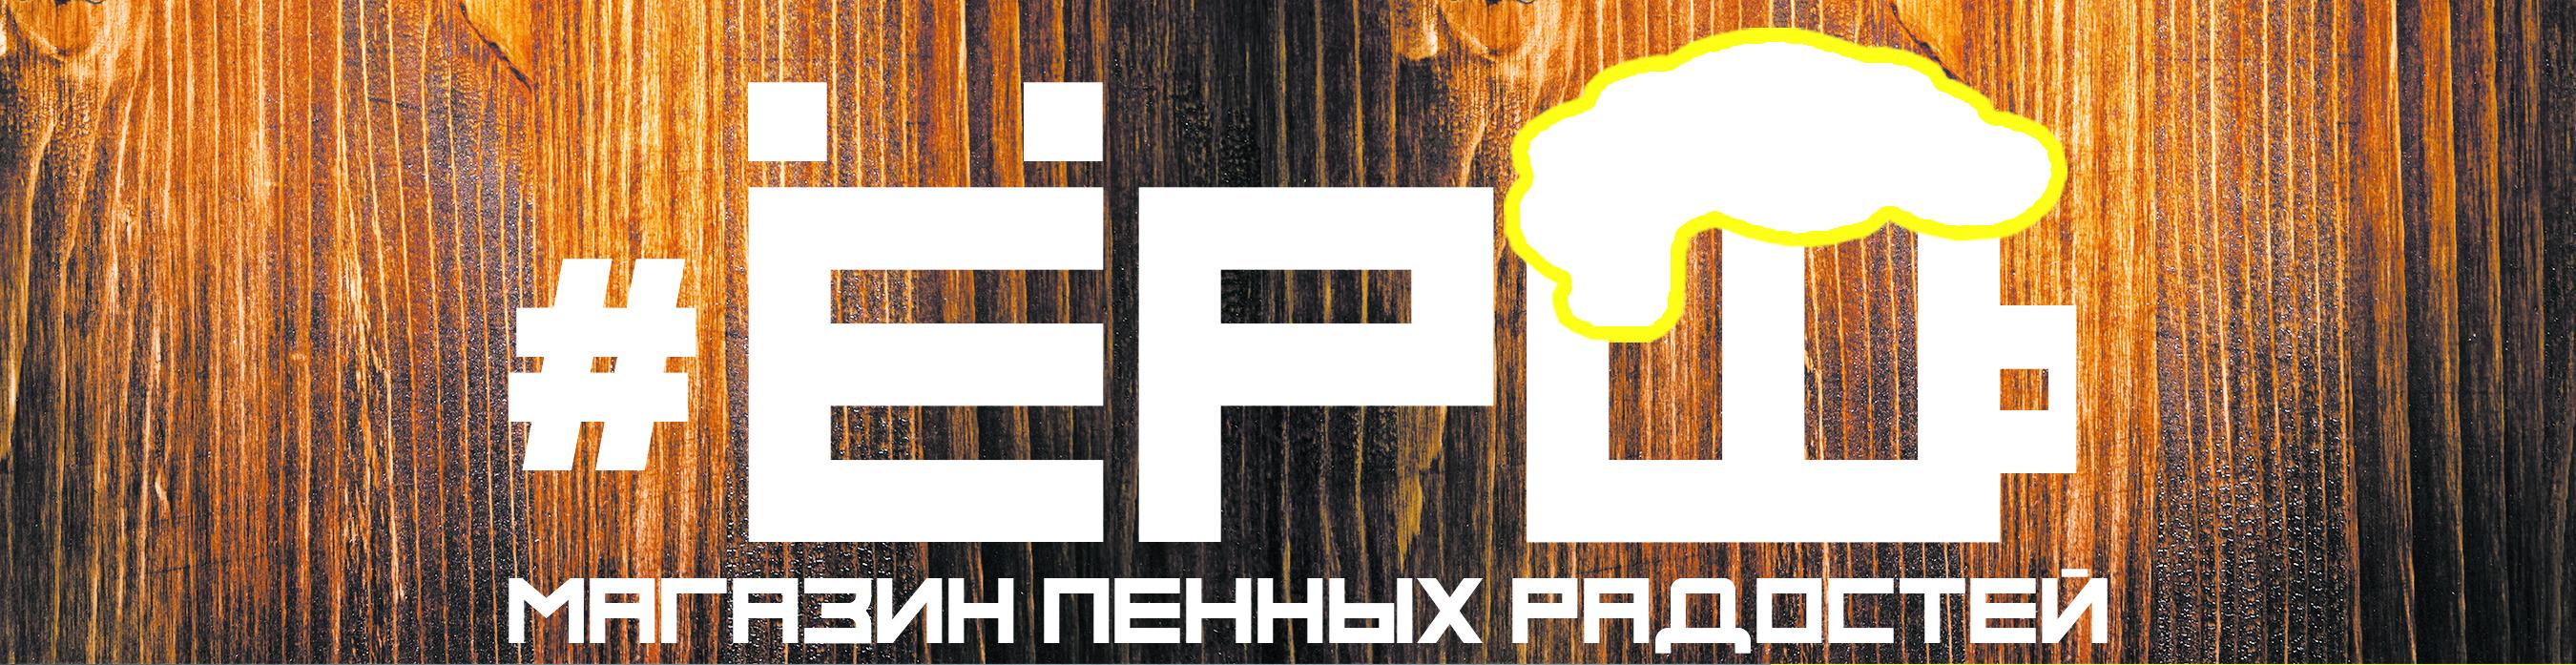 Магазин #ЁРШ